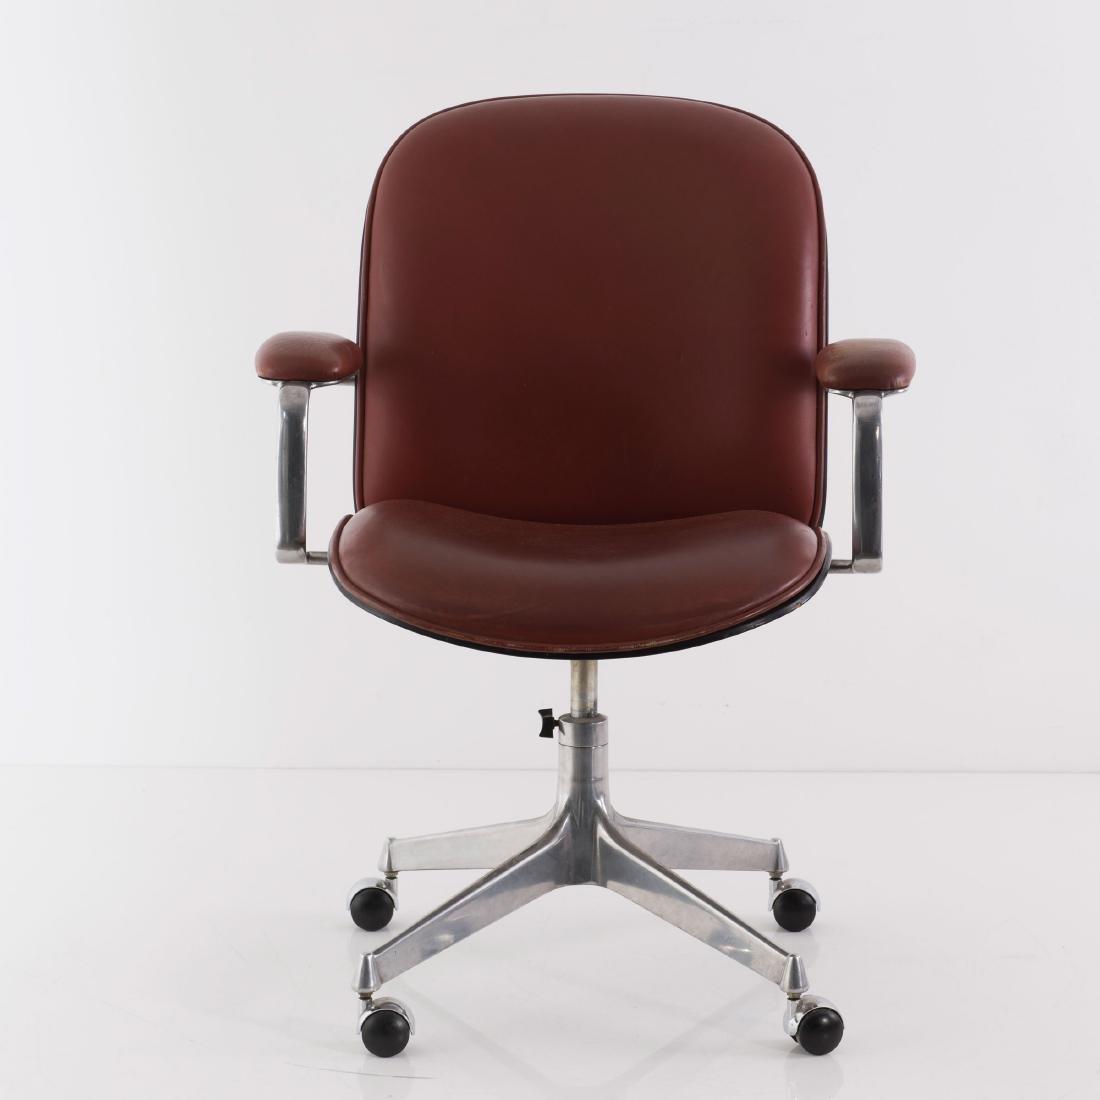 Desk armchair, 1959/60 - 8